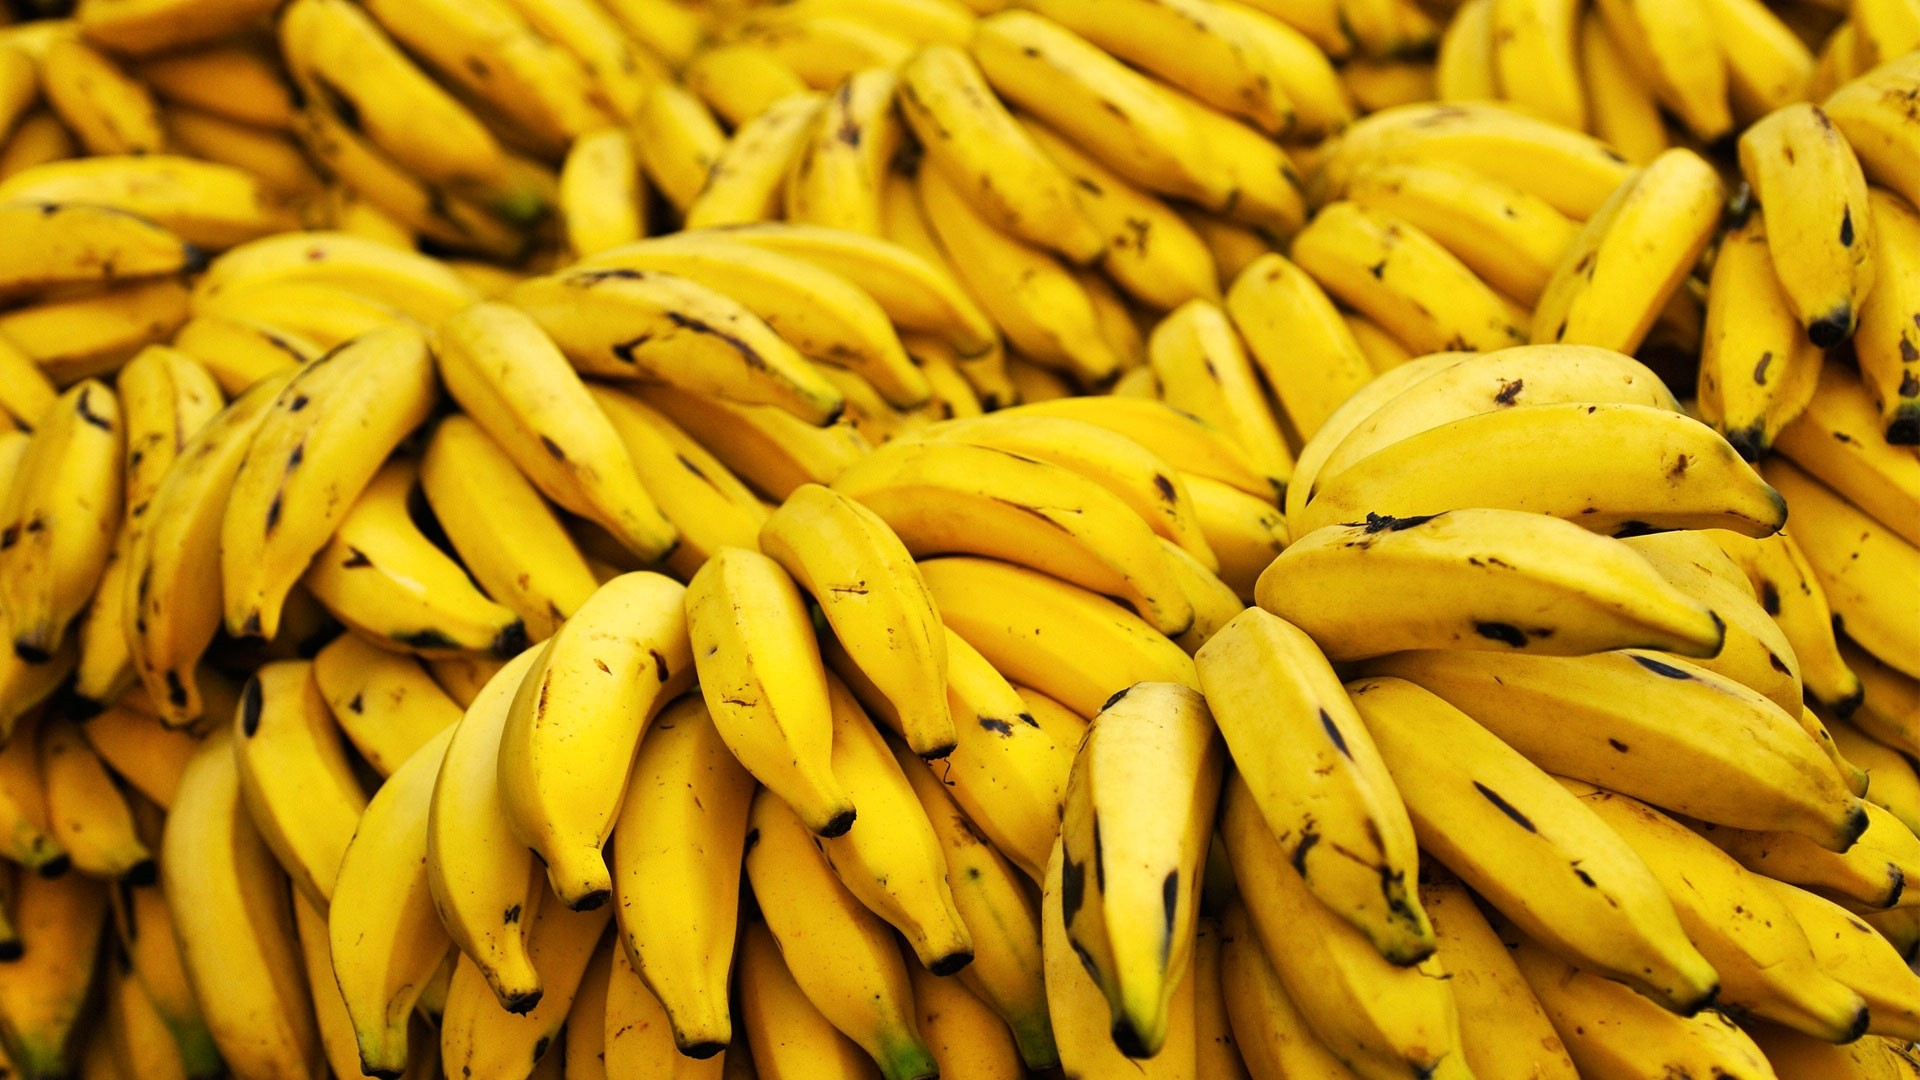 Banana a wallpaper